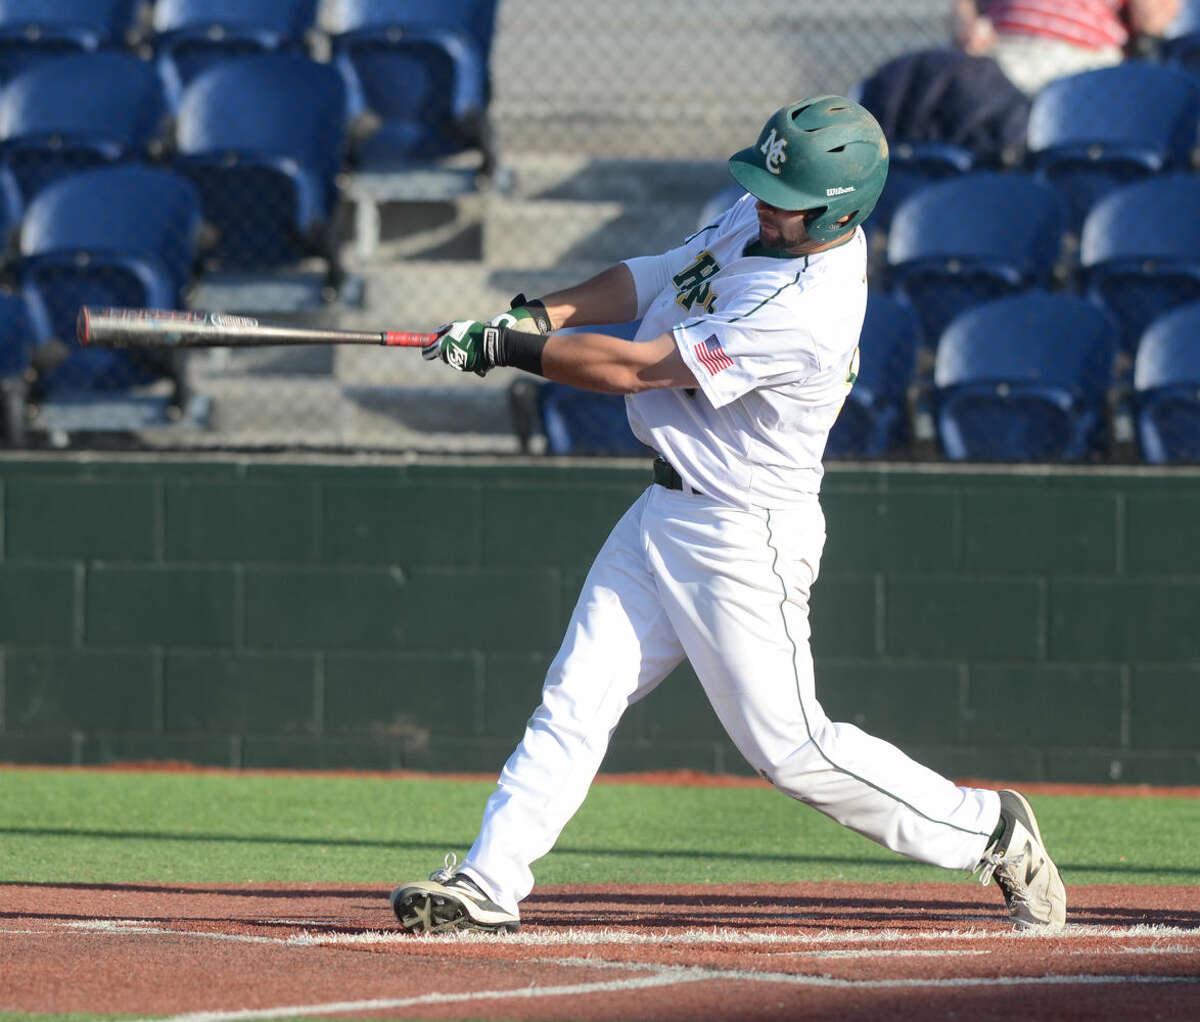 Midland College's Justin Clarkson hits against New Mexico Military Institute on Friday, April 24, 2015, at Christensen Stadium. James Durbin/Reporter-Telegram